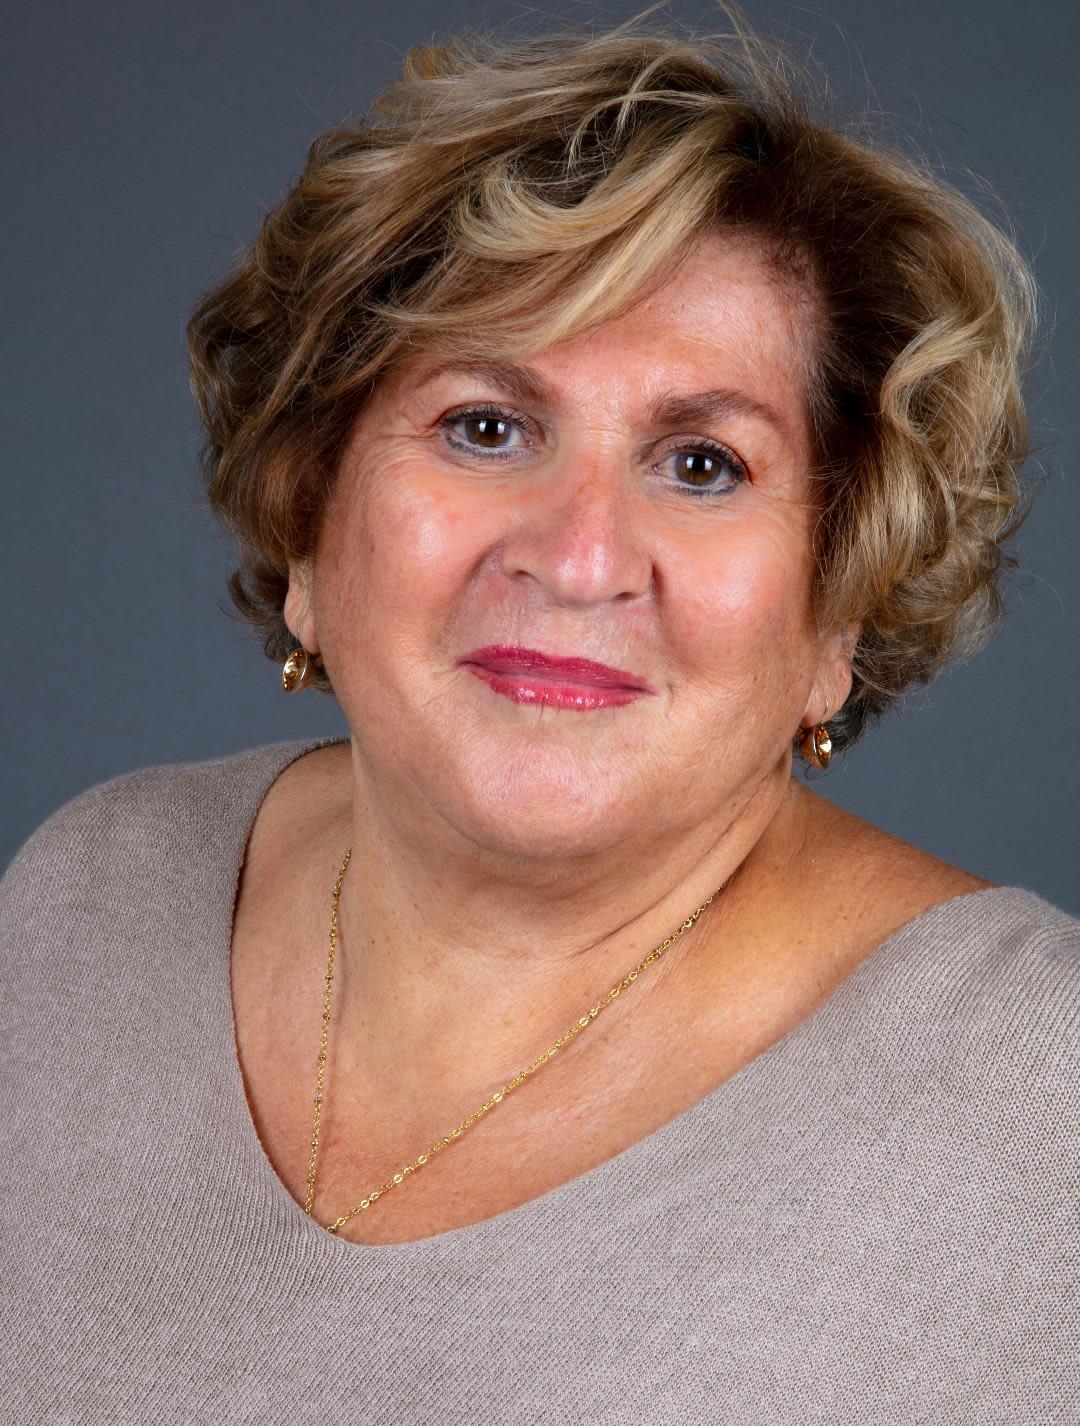 RoselyneKattar